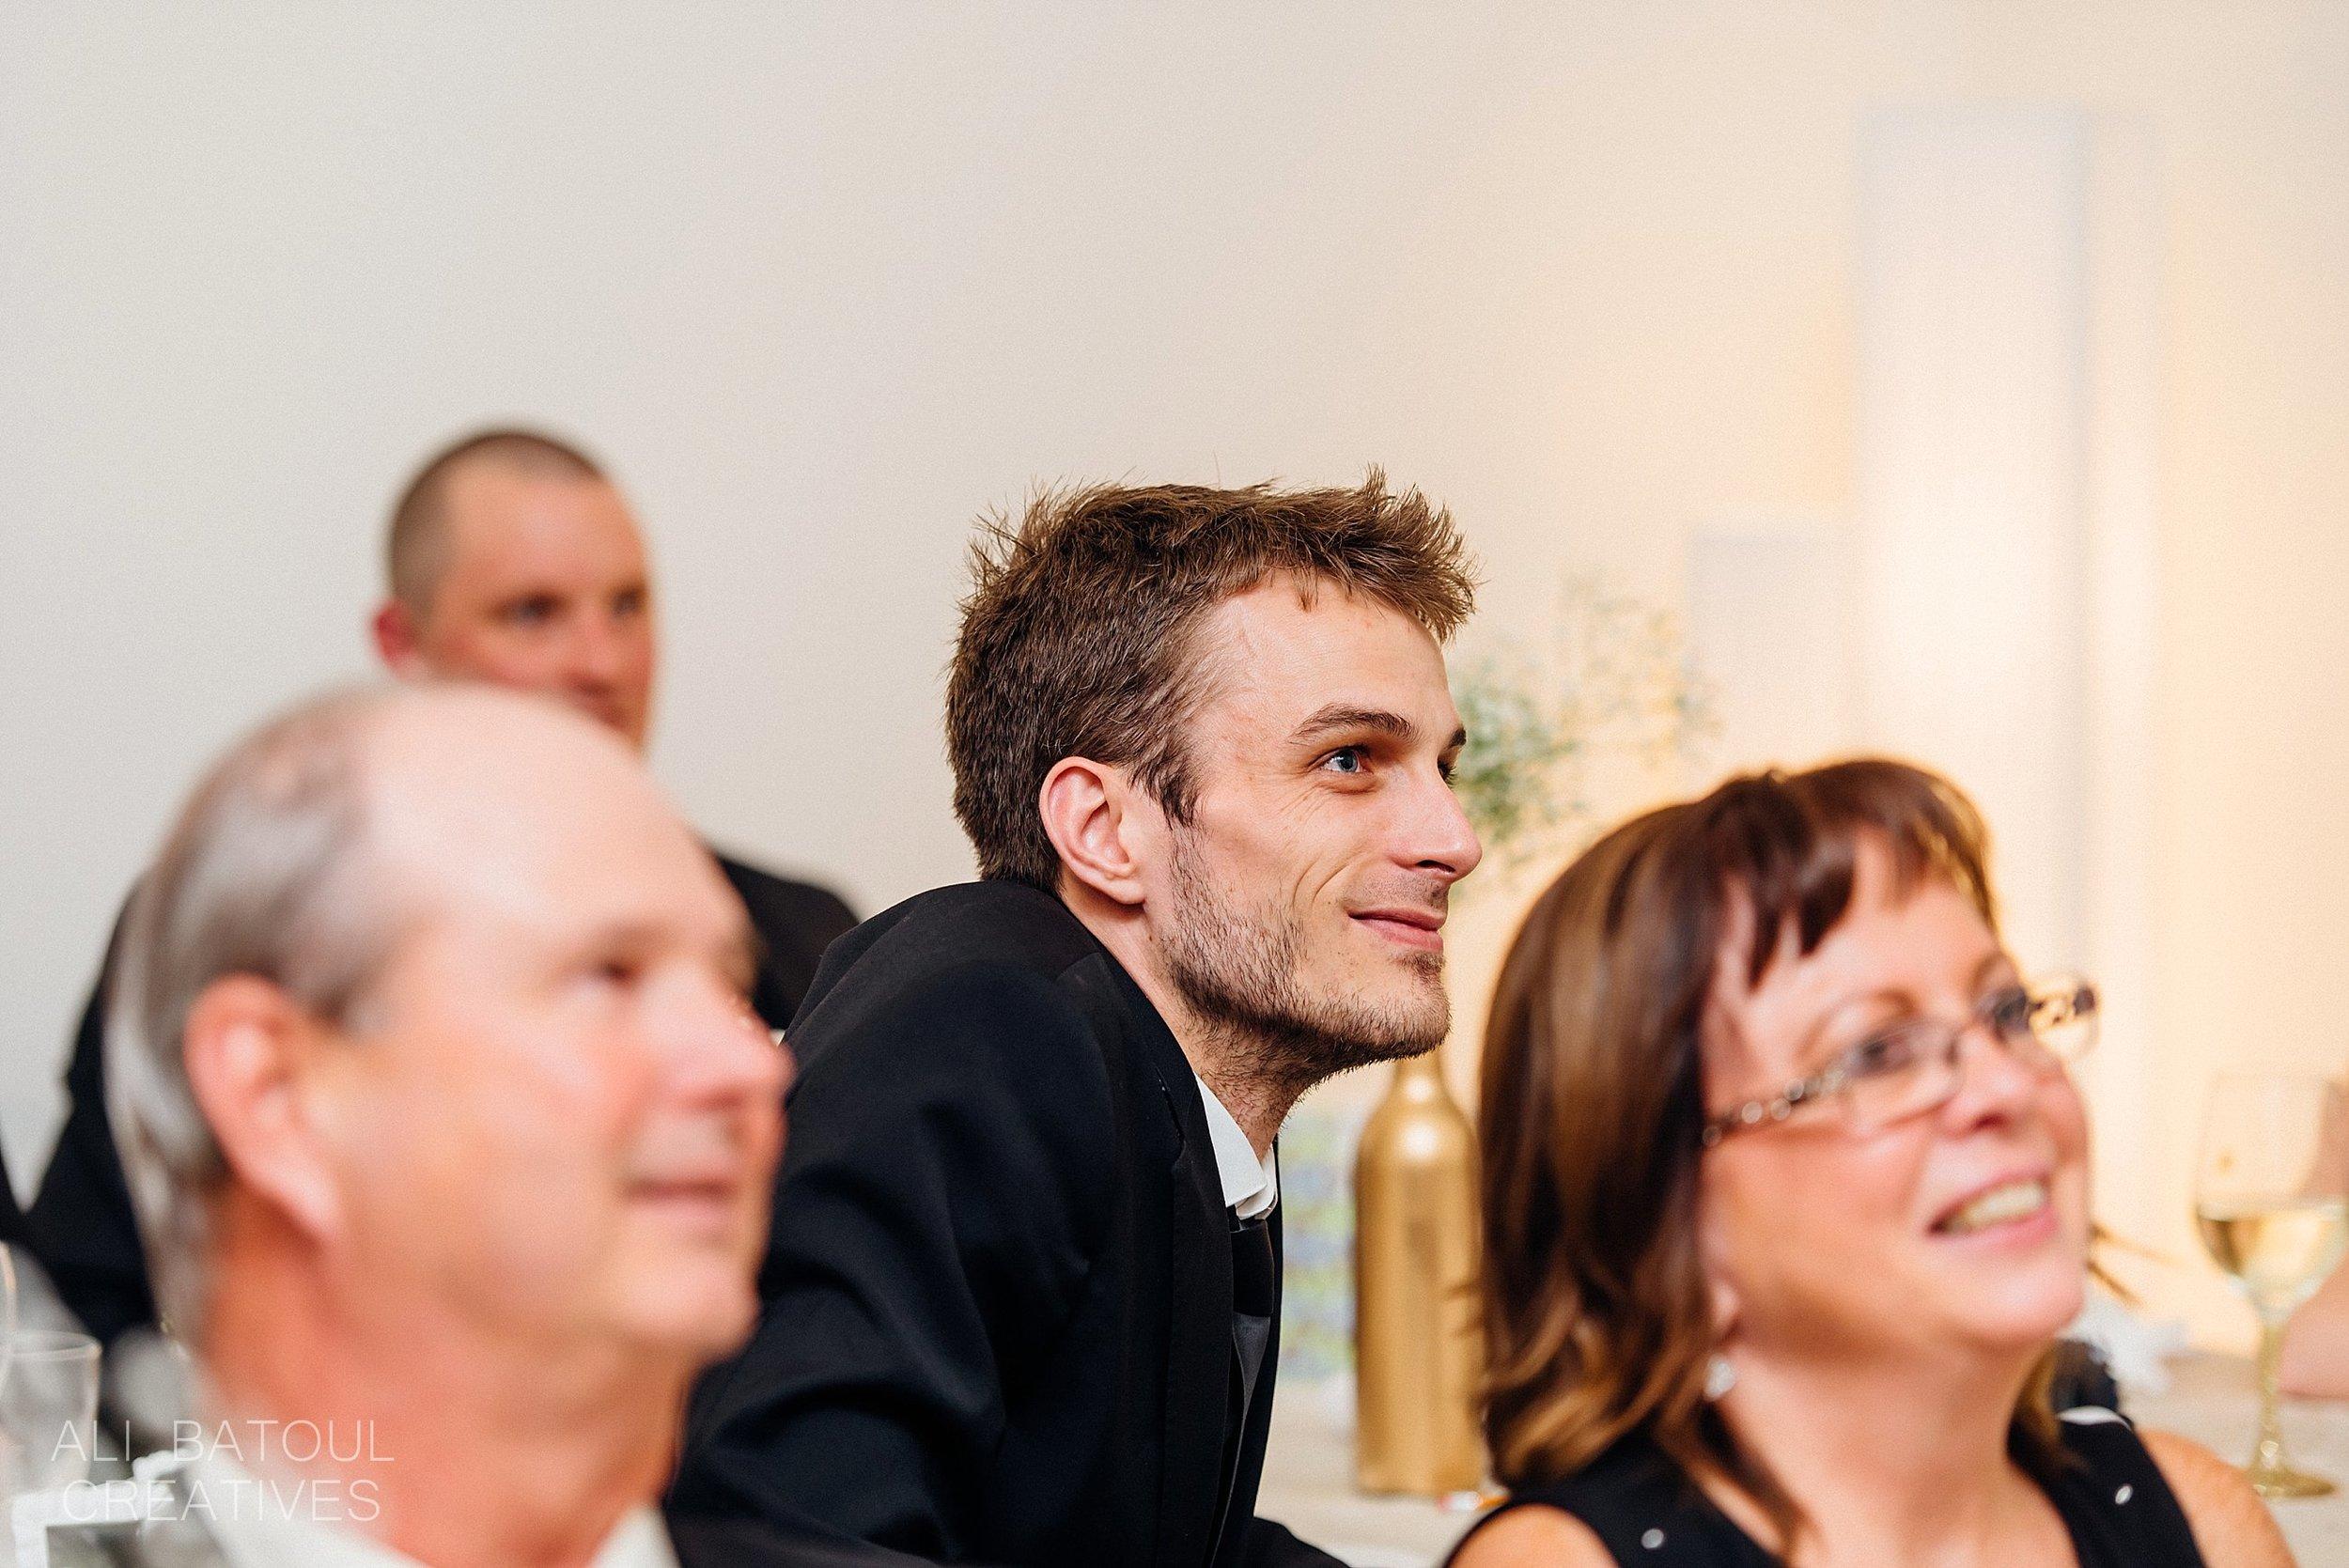 Jocelyn + Steve At The Schoolhouse Wedding - Ali and Batoul Fine Art Wedding Photography_0088.jpg